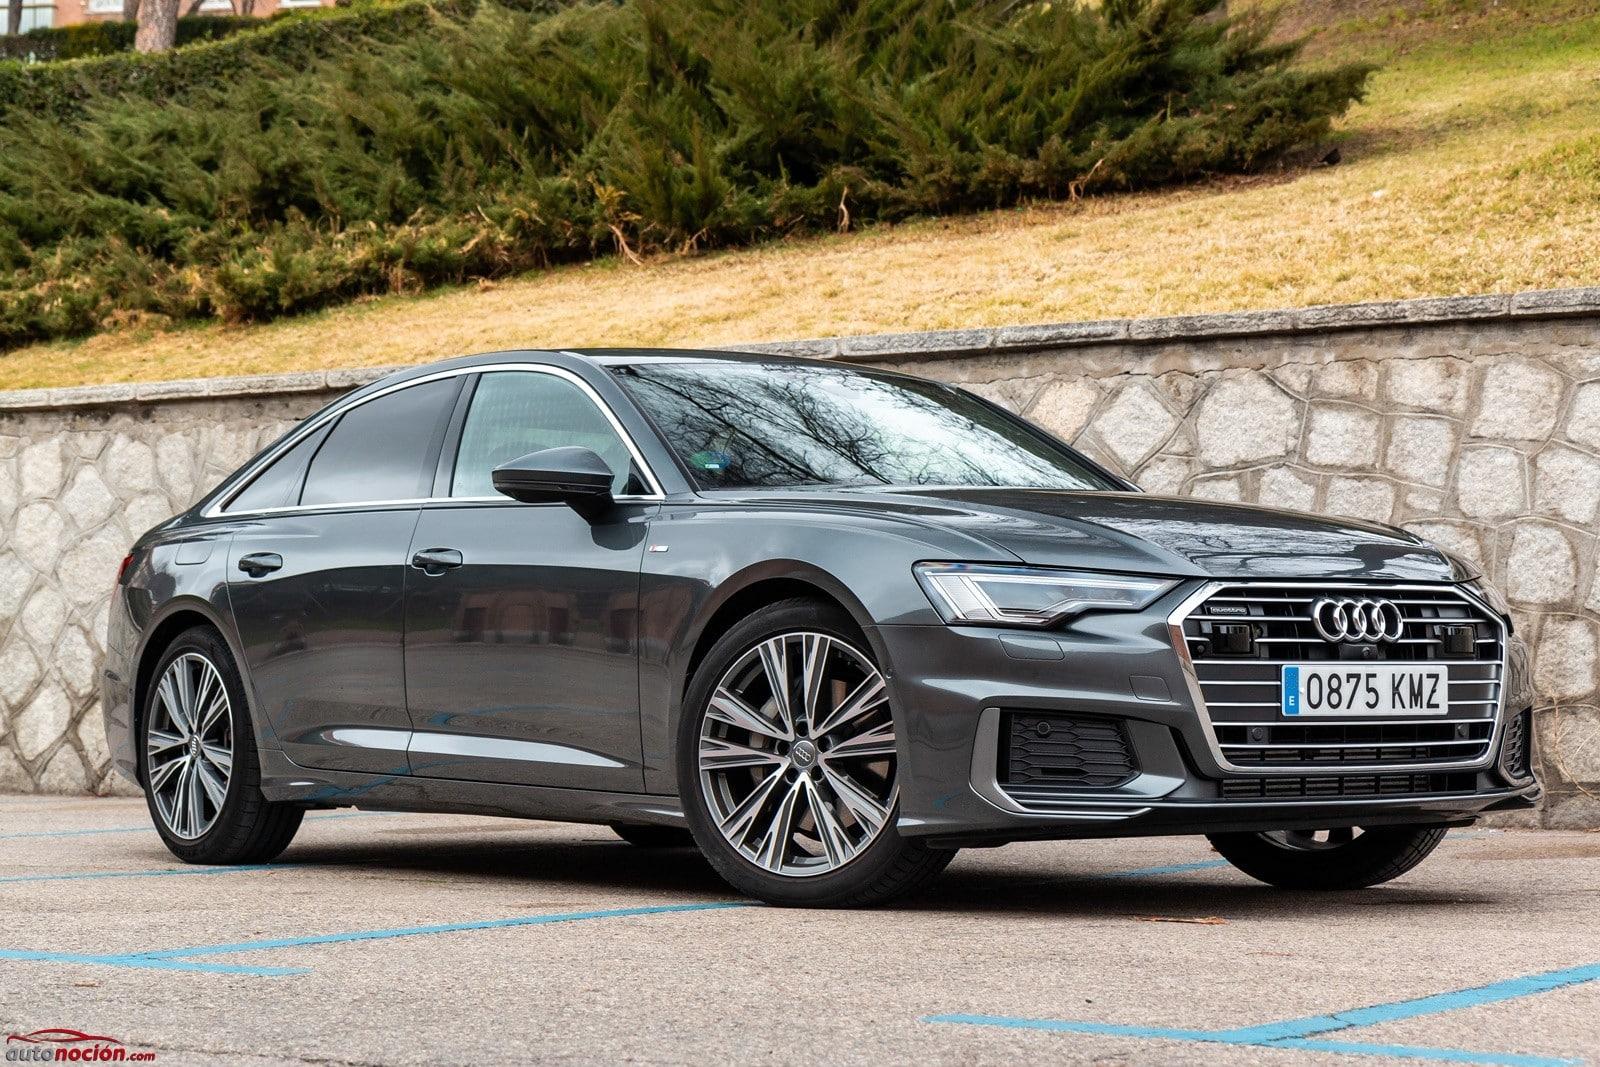 Opinión Y Prueba Audi A6 Berlina 45 Tdi Diésel 2019